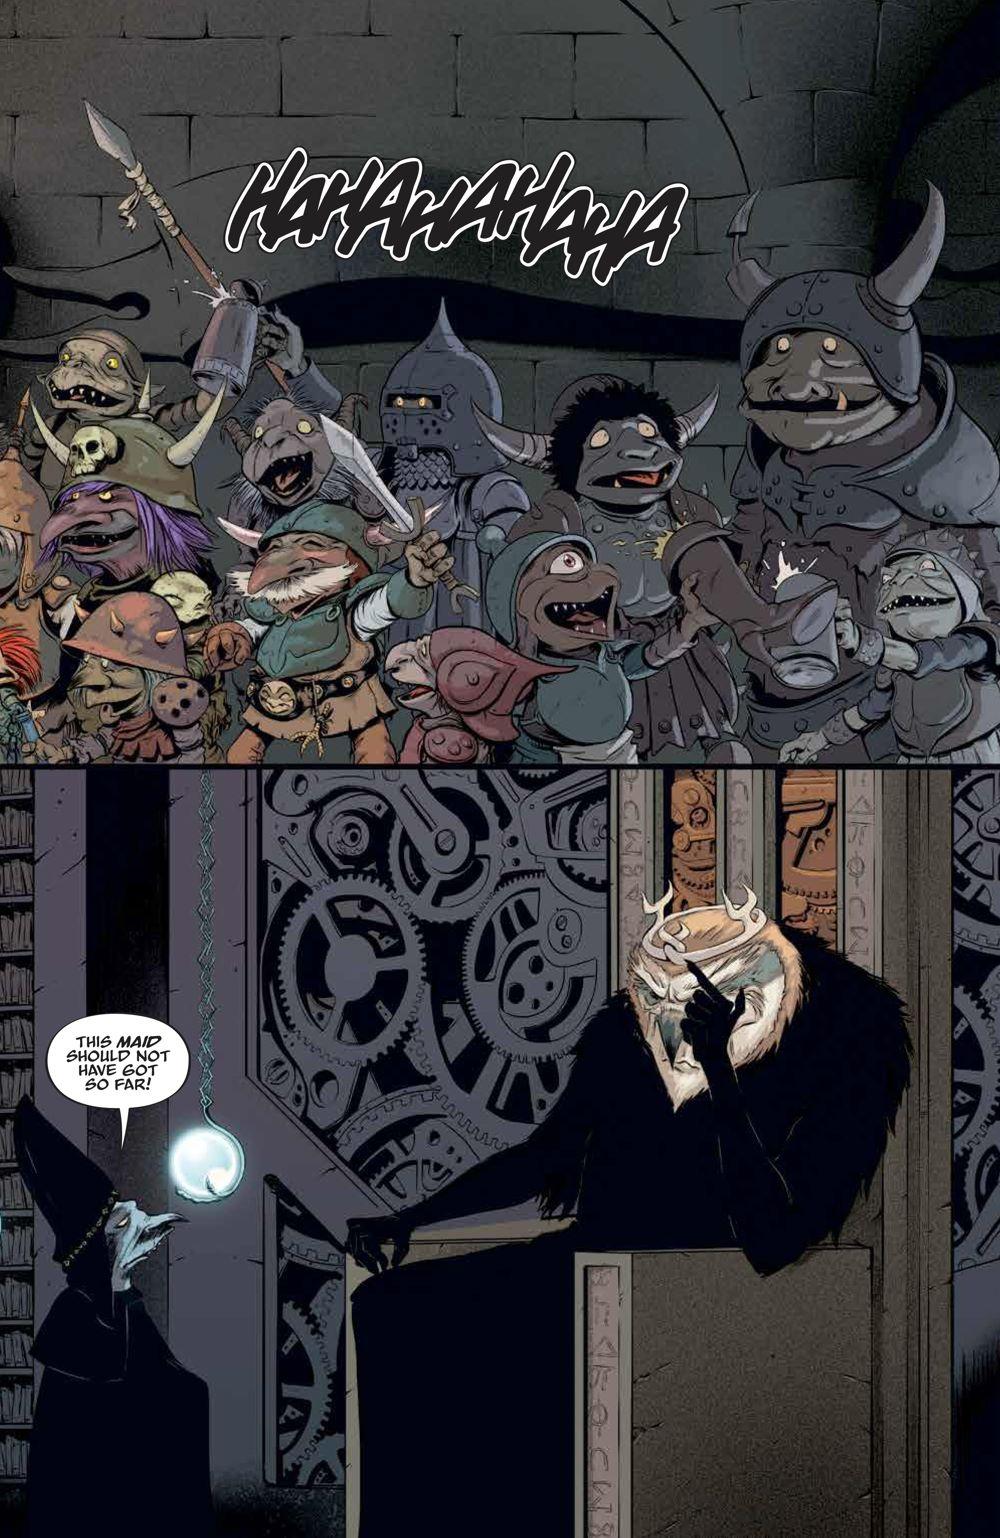 LabyrinthCoronation_v2_SC_PRESS_11 ComicList Previews: JIM HENSON'S LABYRINTH CORONATION VOLUME 2 TP